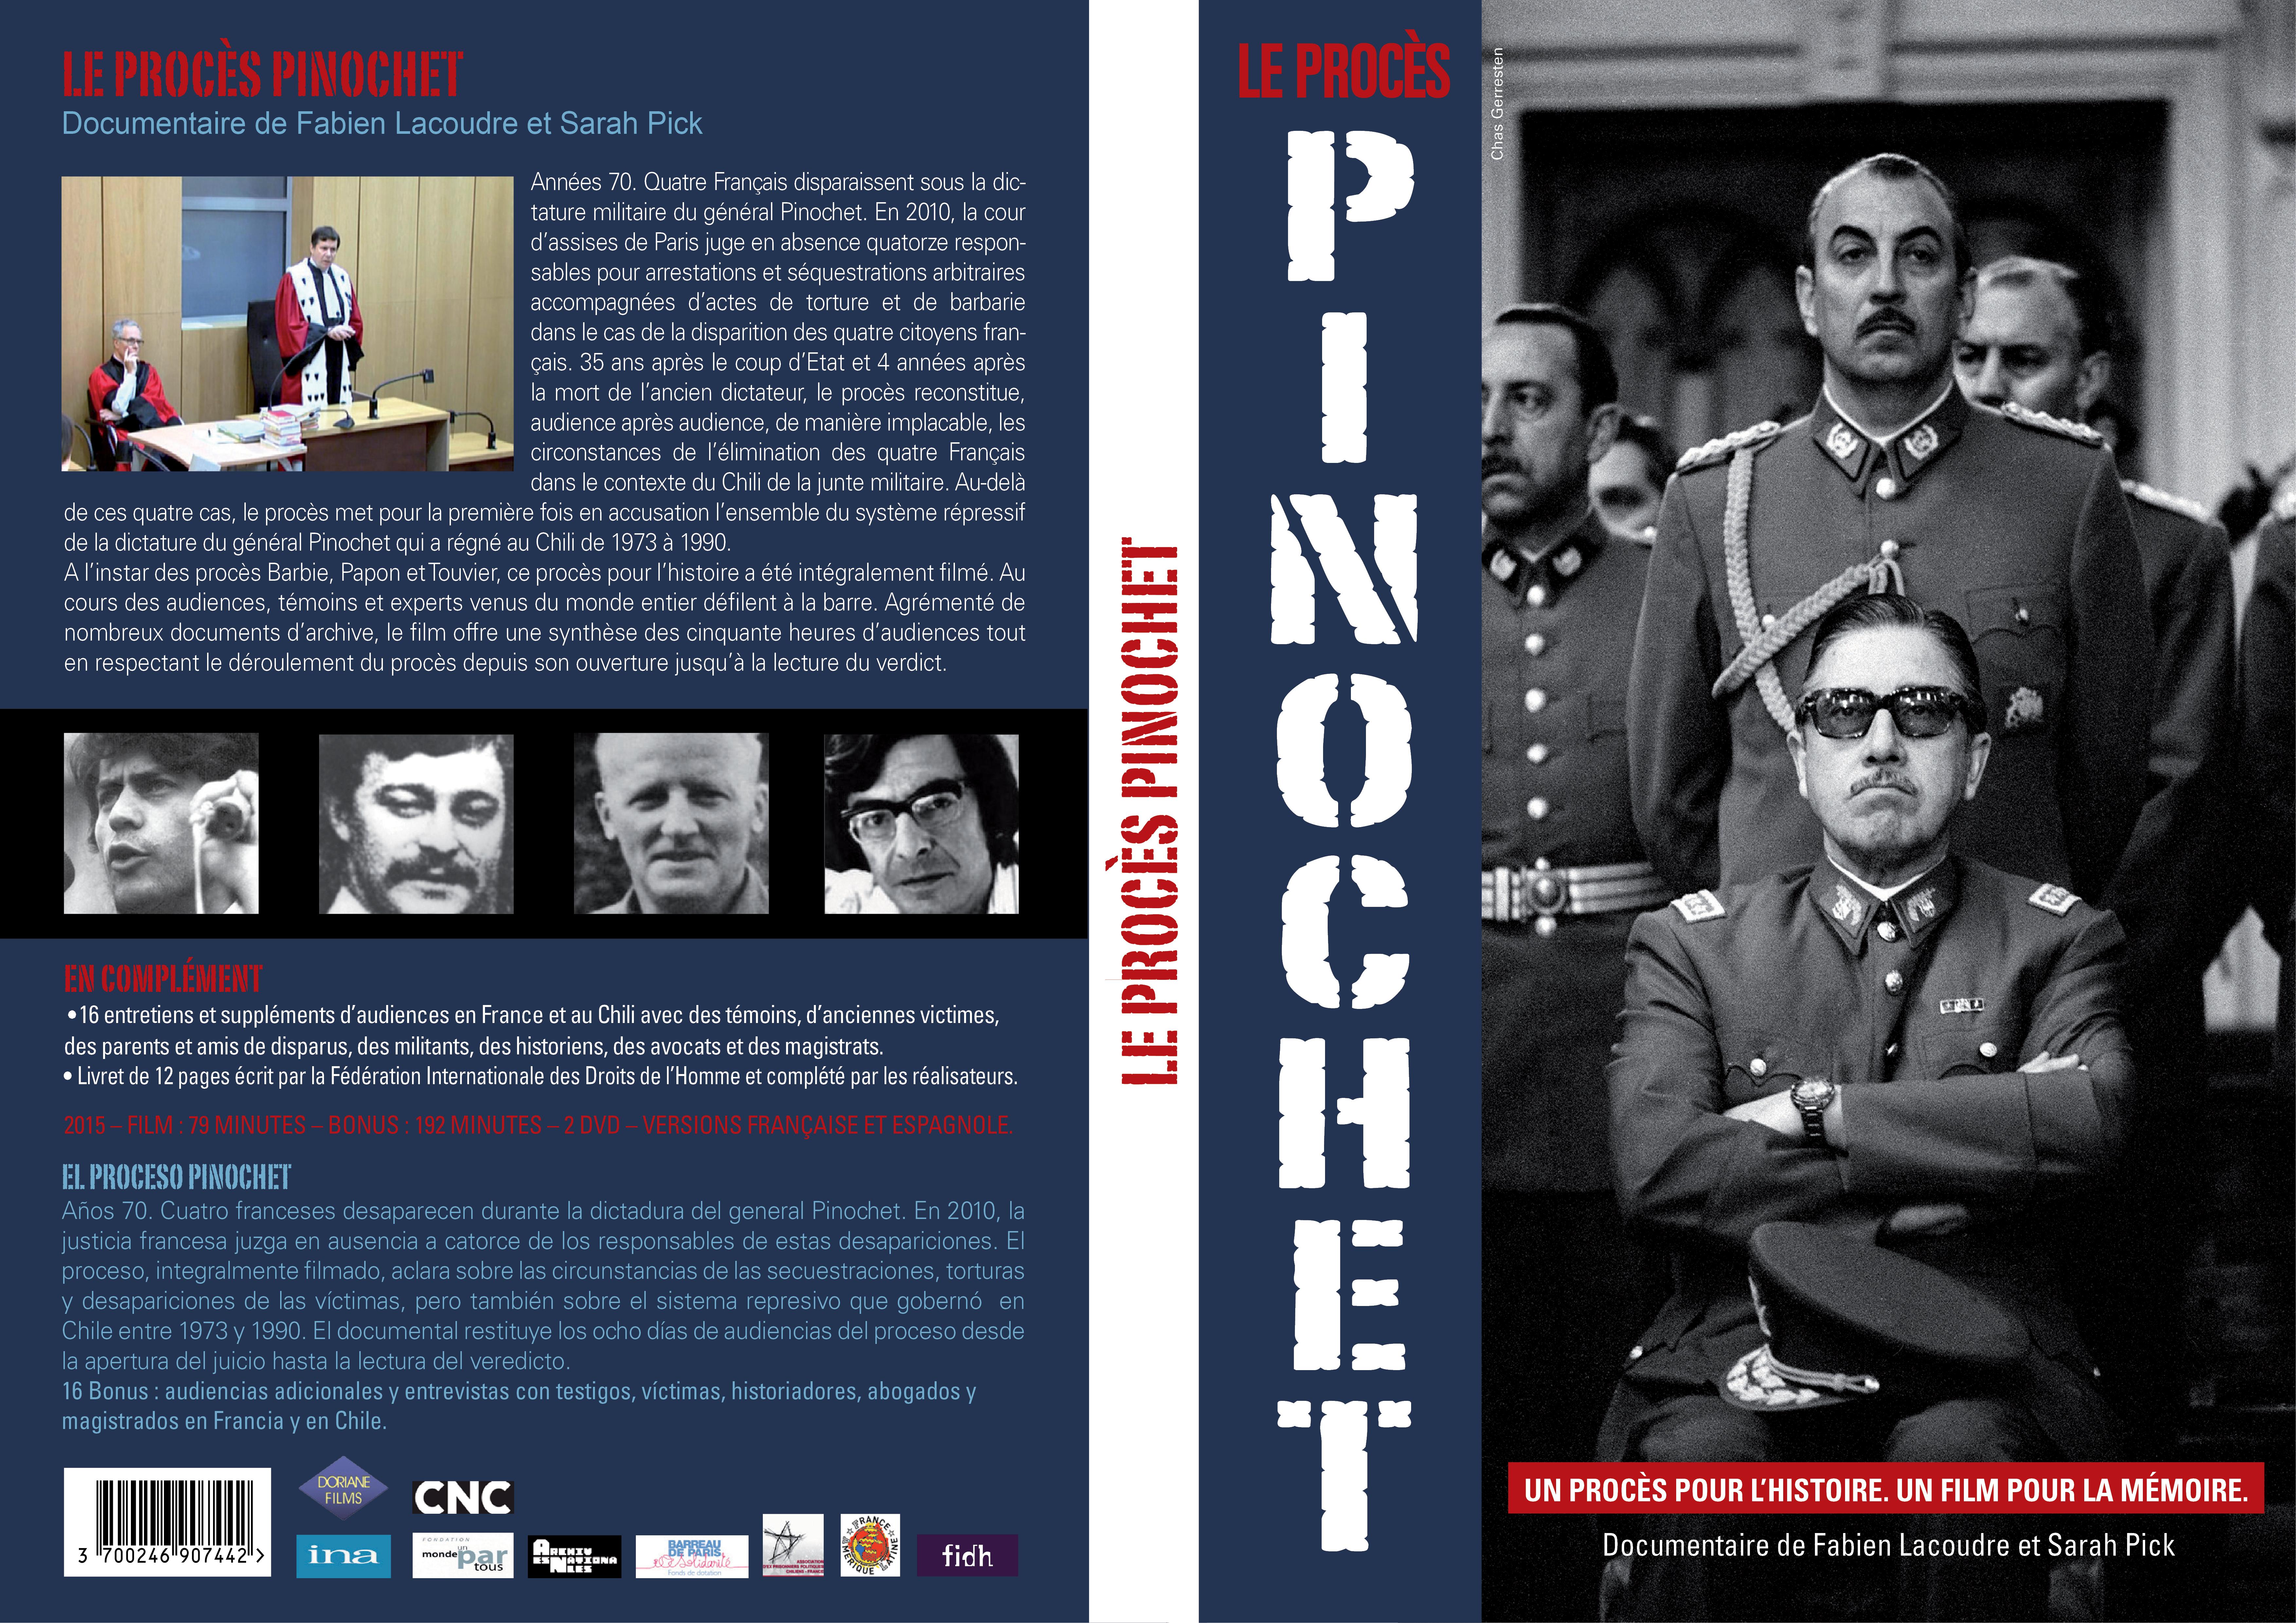 Le procès Pinochet en Film et Coffret DVD